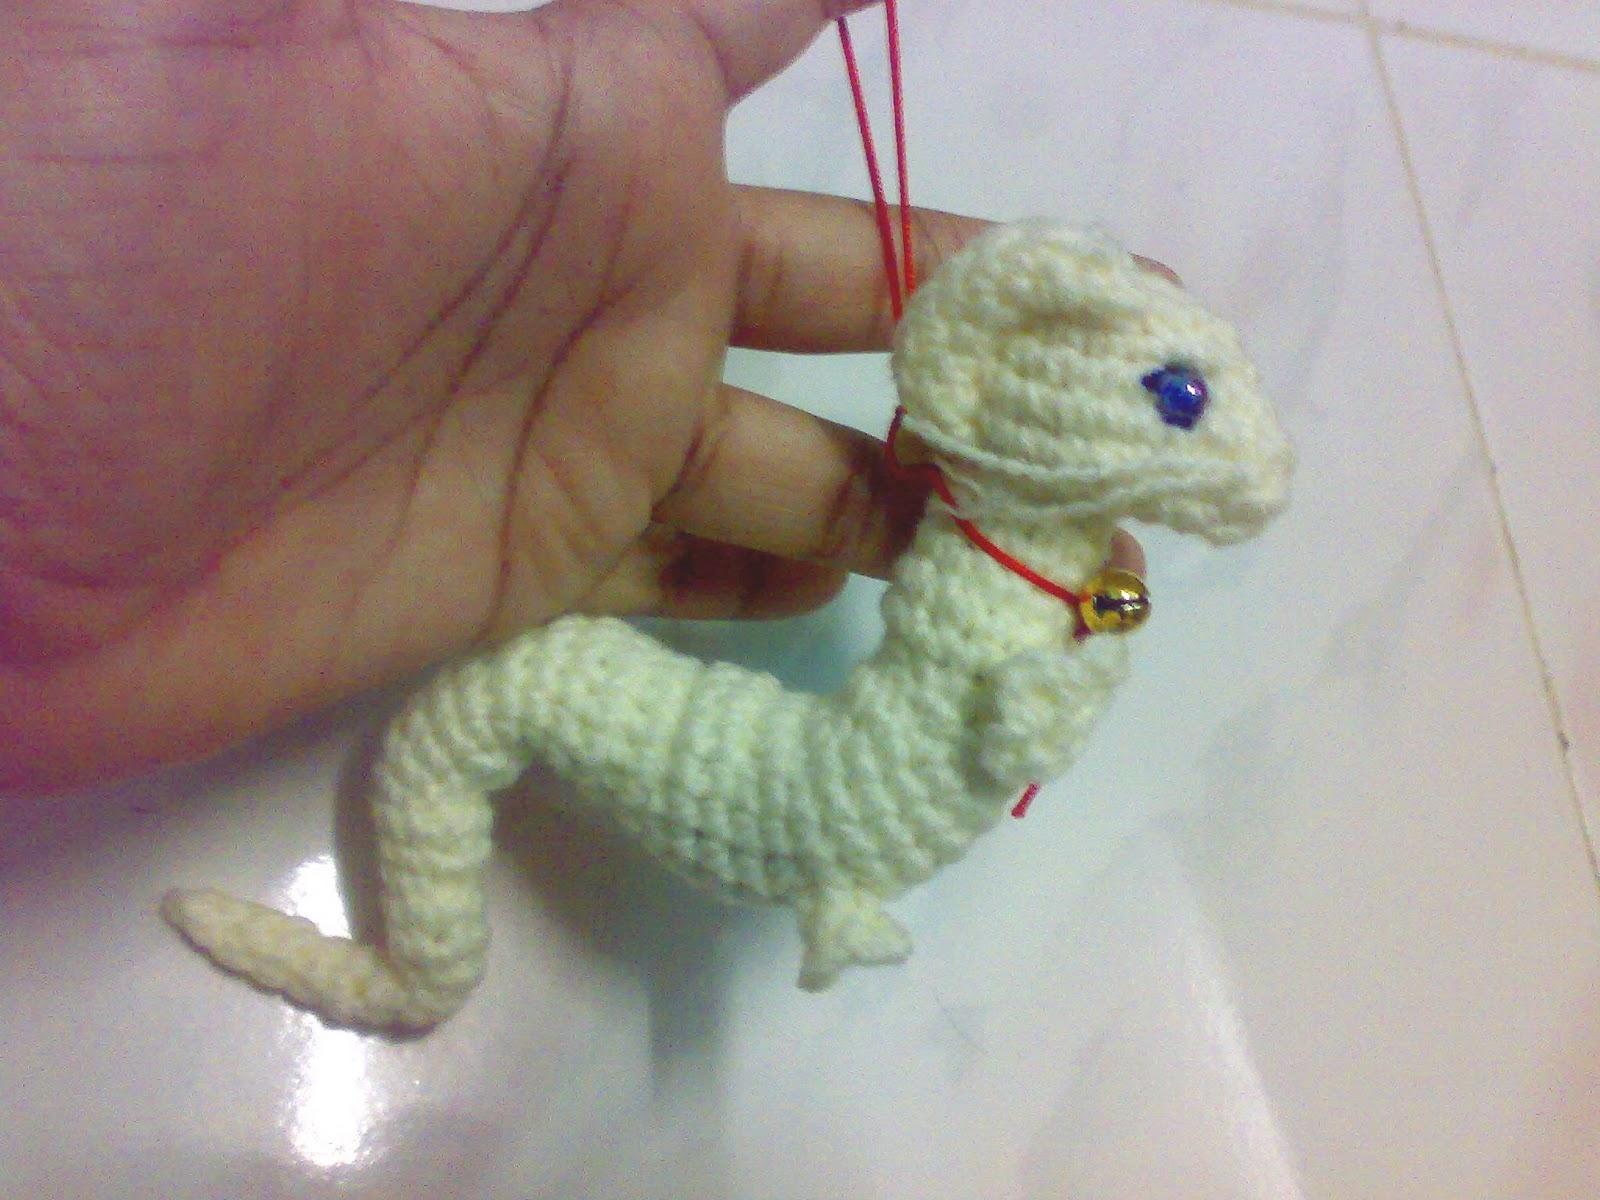 Baby Dragon Amigurumi Pattern : My Skills Guide: Baby Asian Dragon Amigurumi